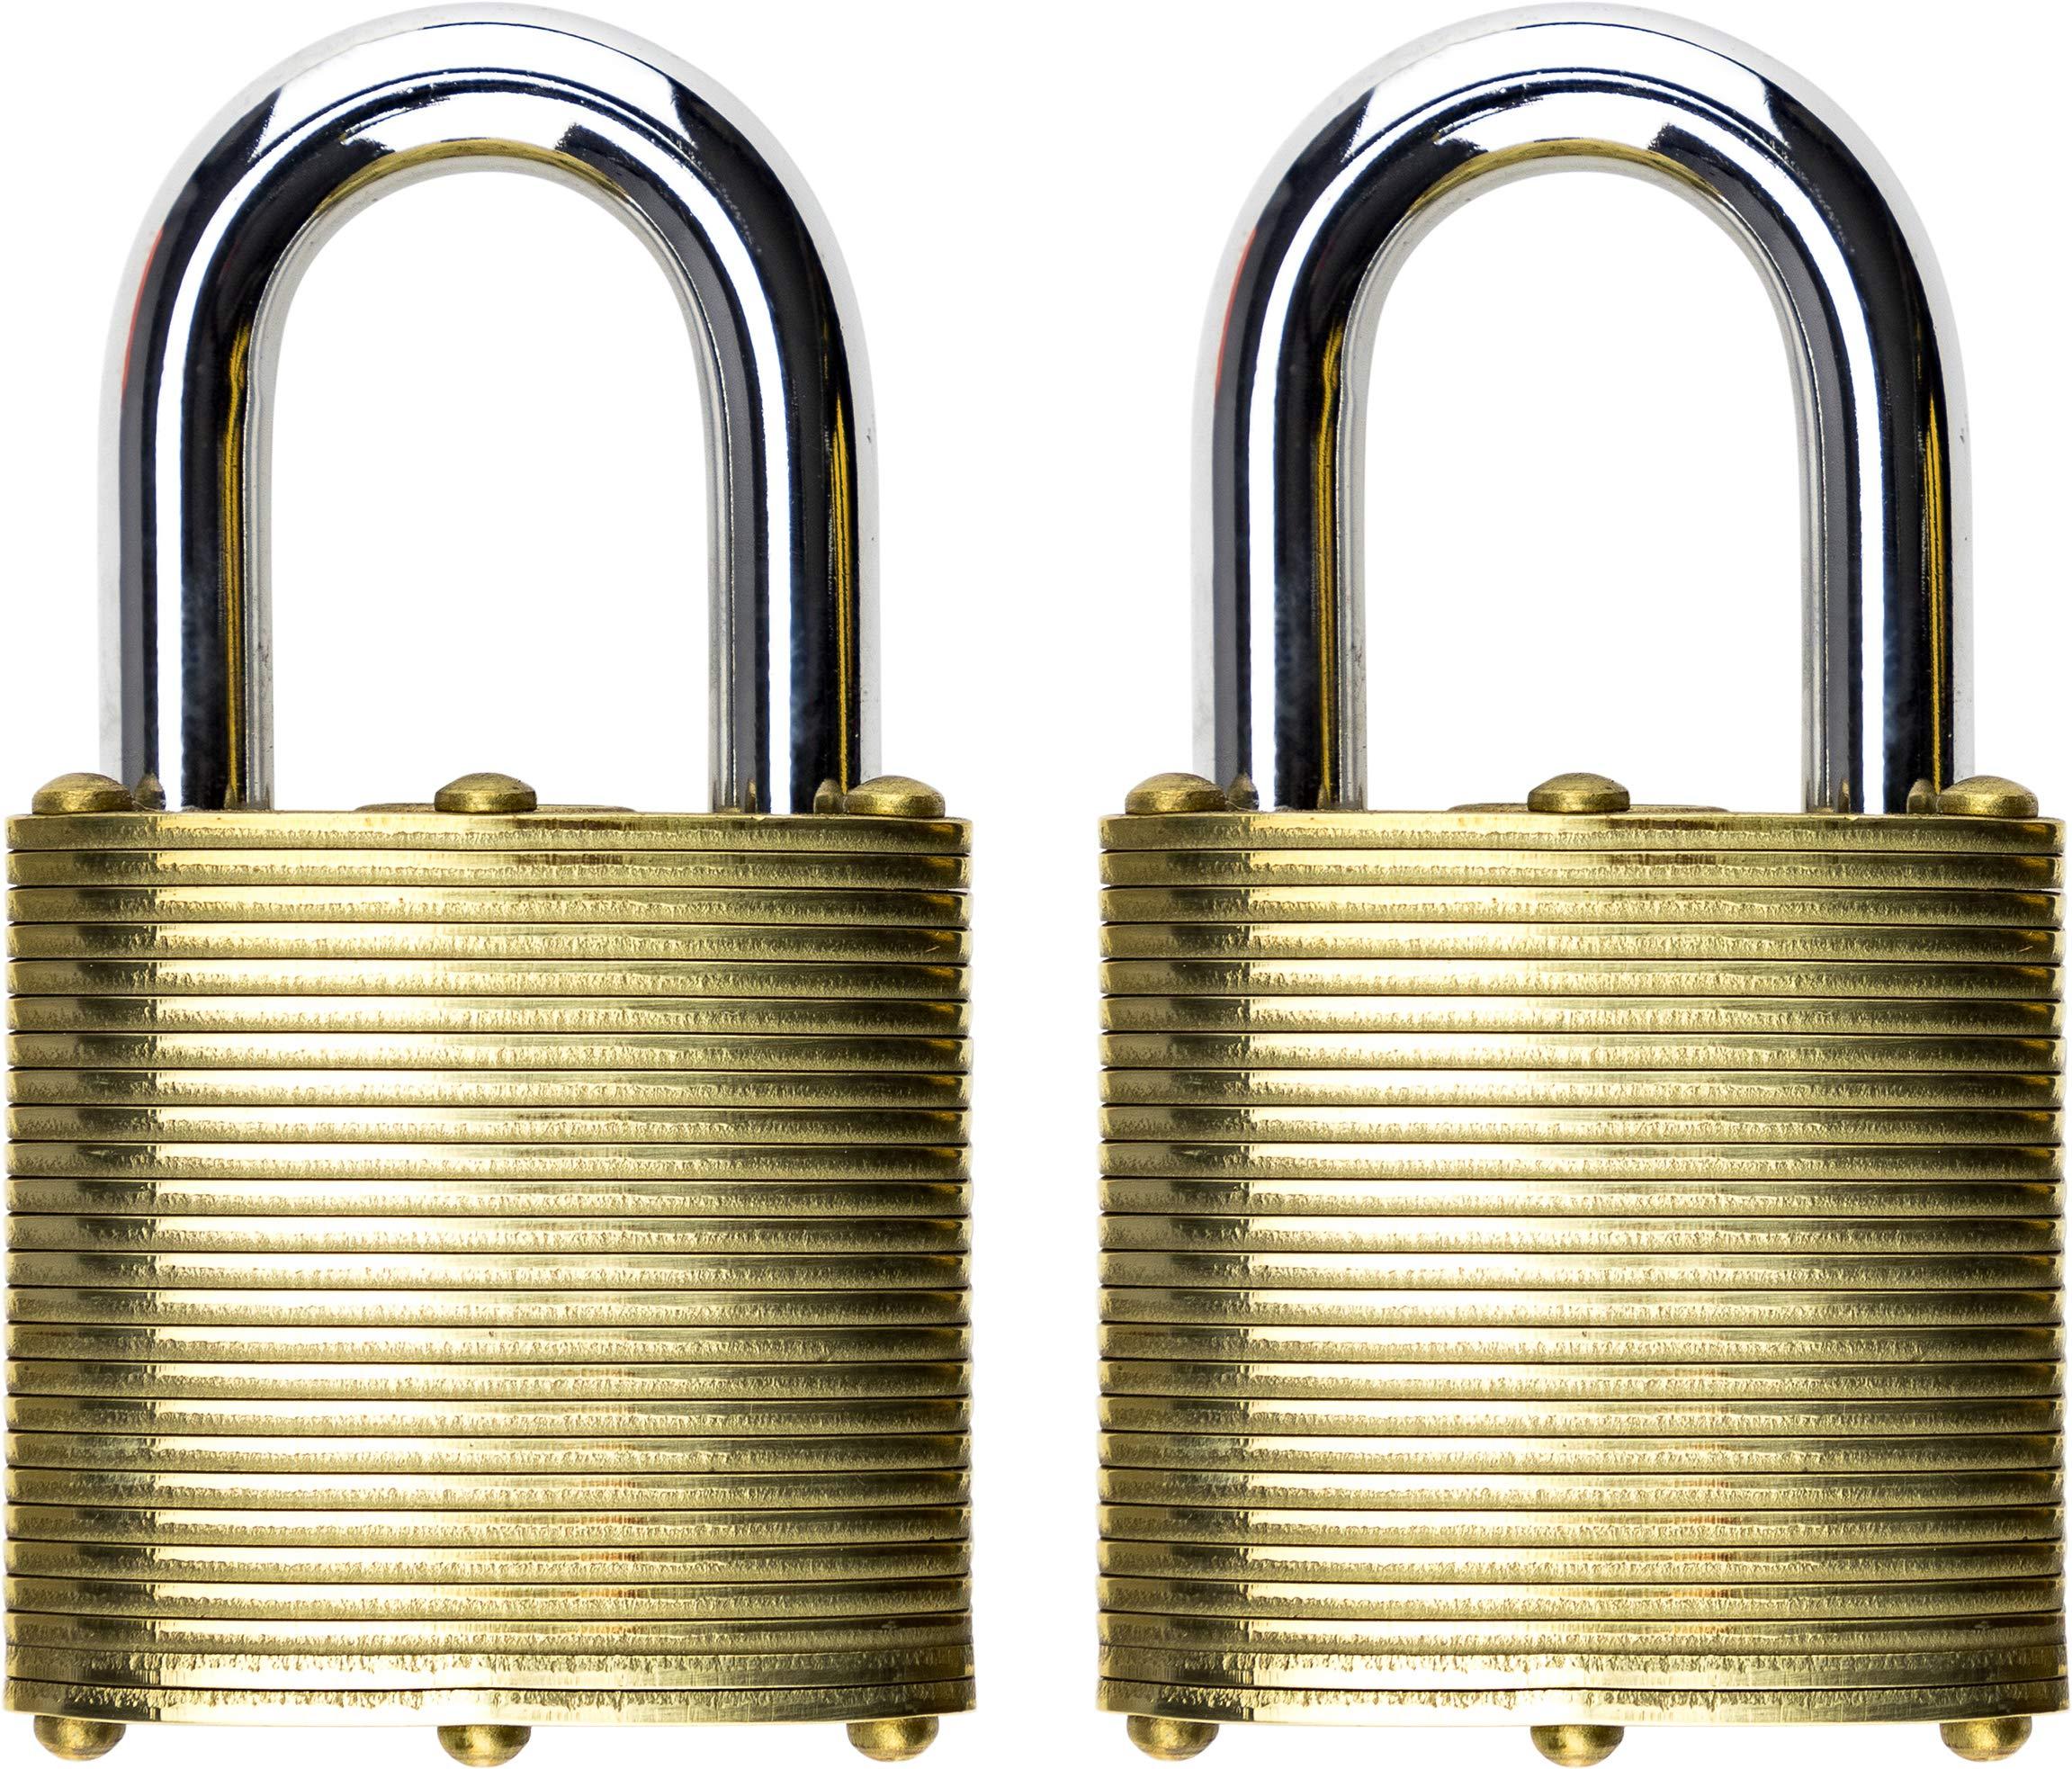 Commando Lock 3002 Marine Series Military Grade Brass Lock (40 Millimeter) (2 Pack) by Commando Lock